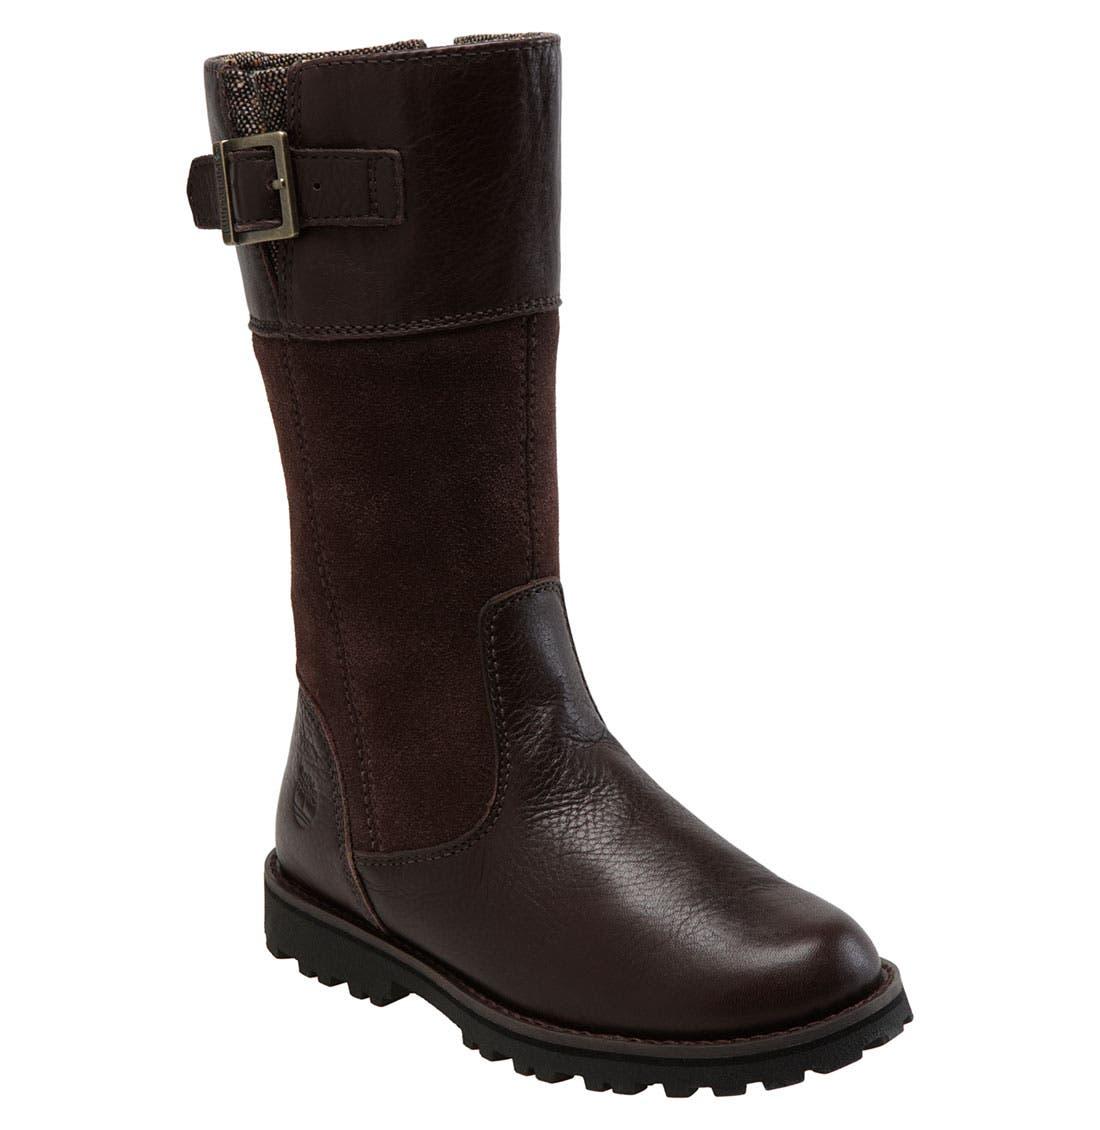 Alternate Image 1 Selected - Timberland 'Maplebrook' Tall Boot (Walker, Toddler, Little Kid & Big Kid)